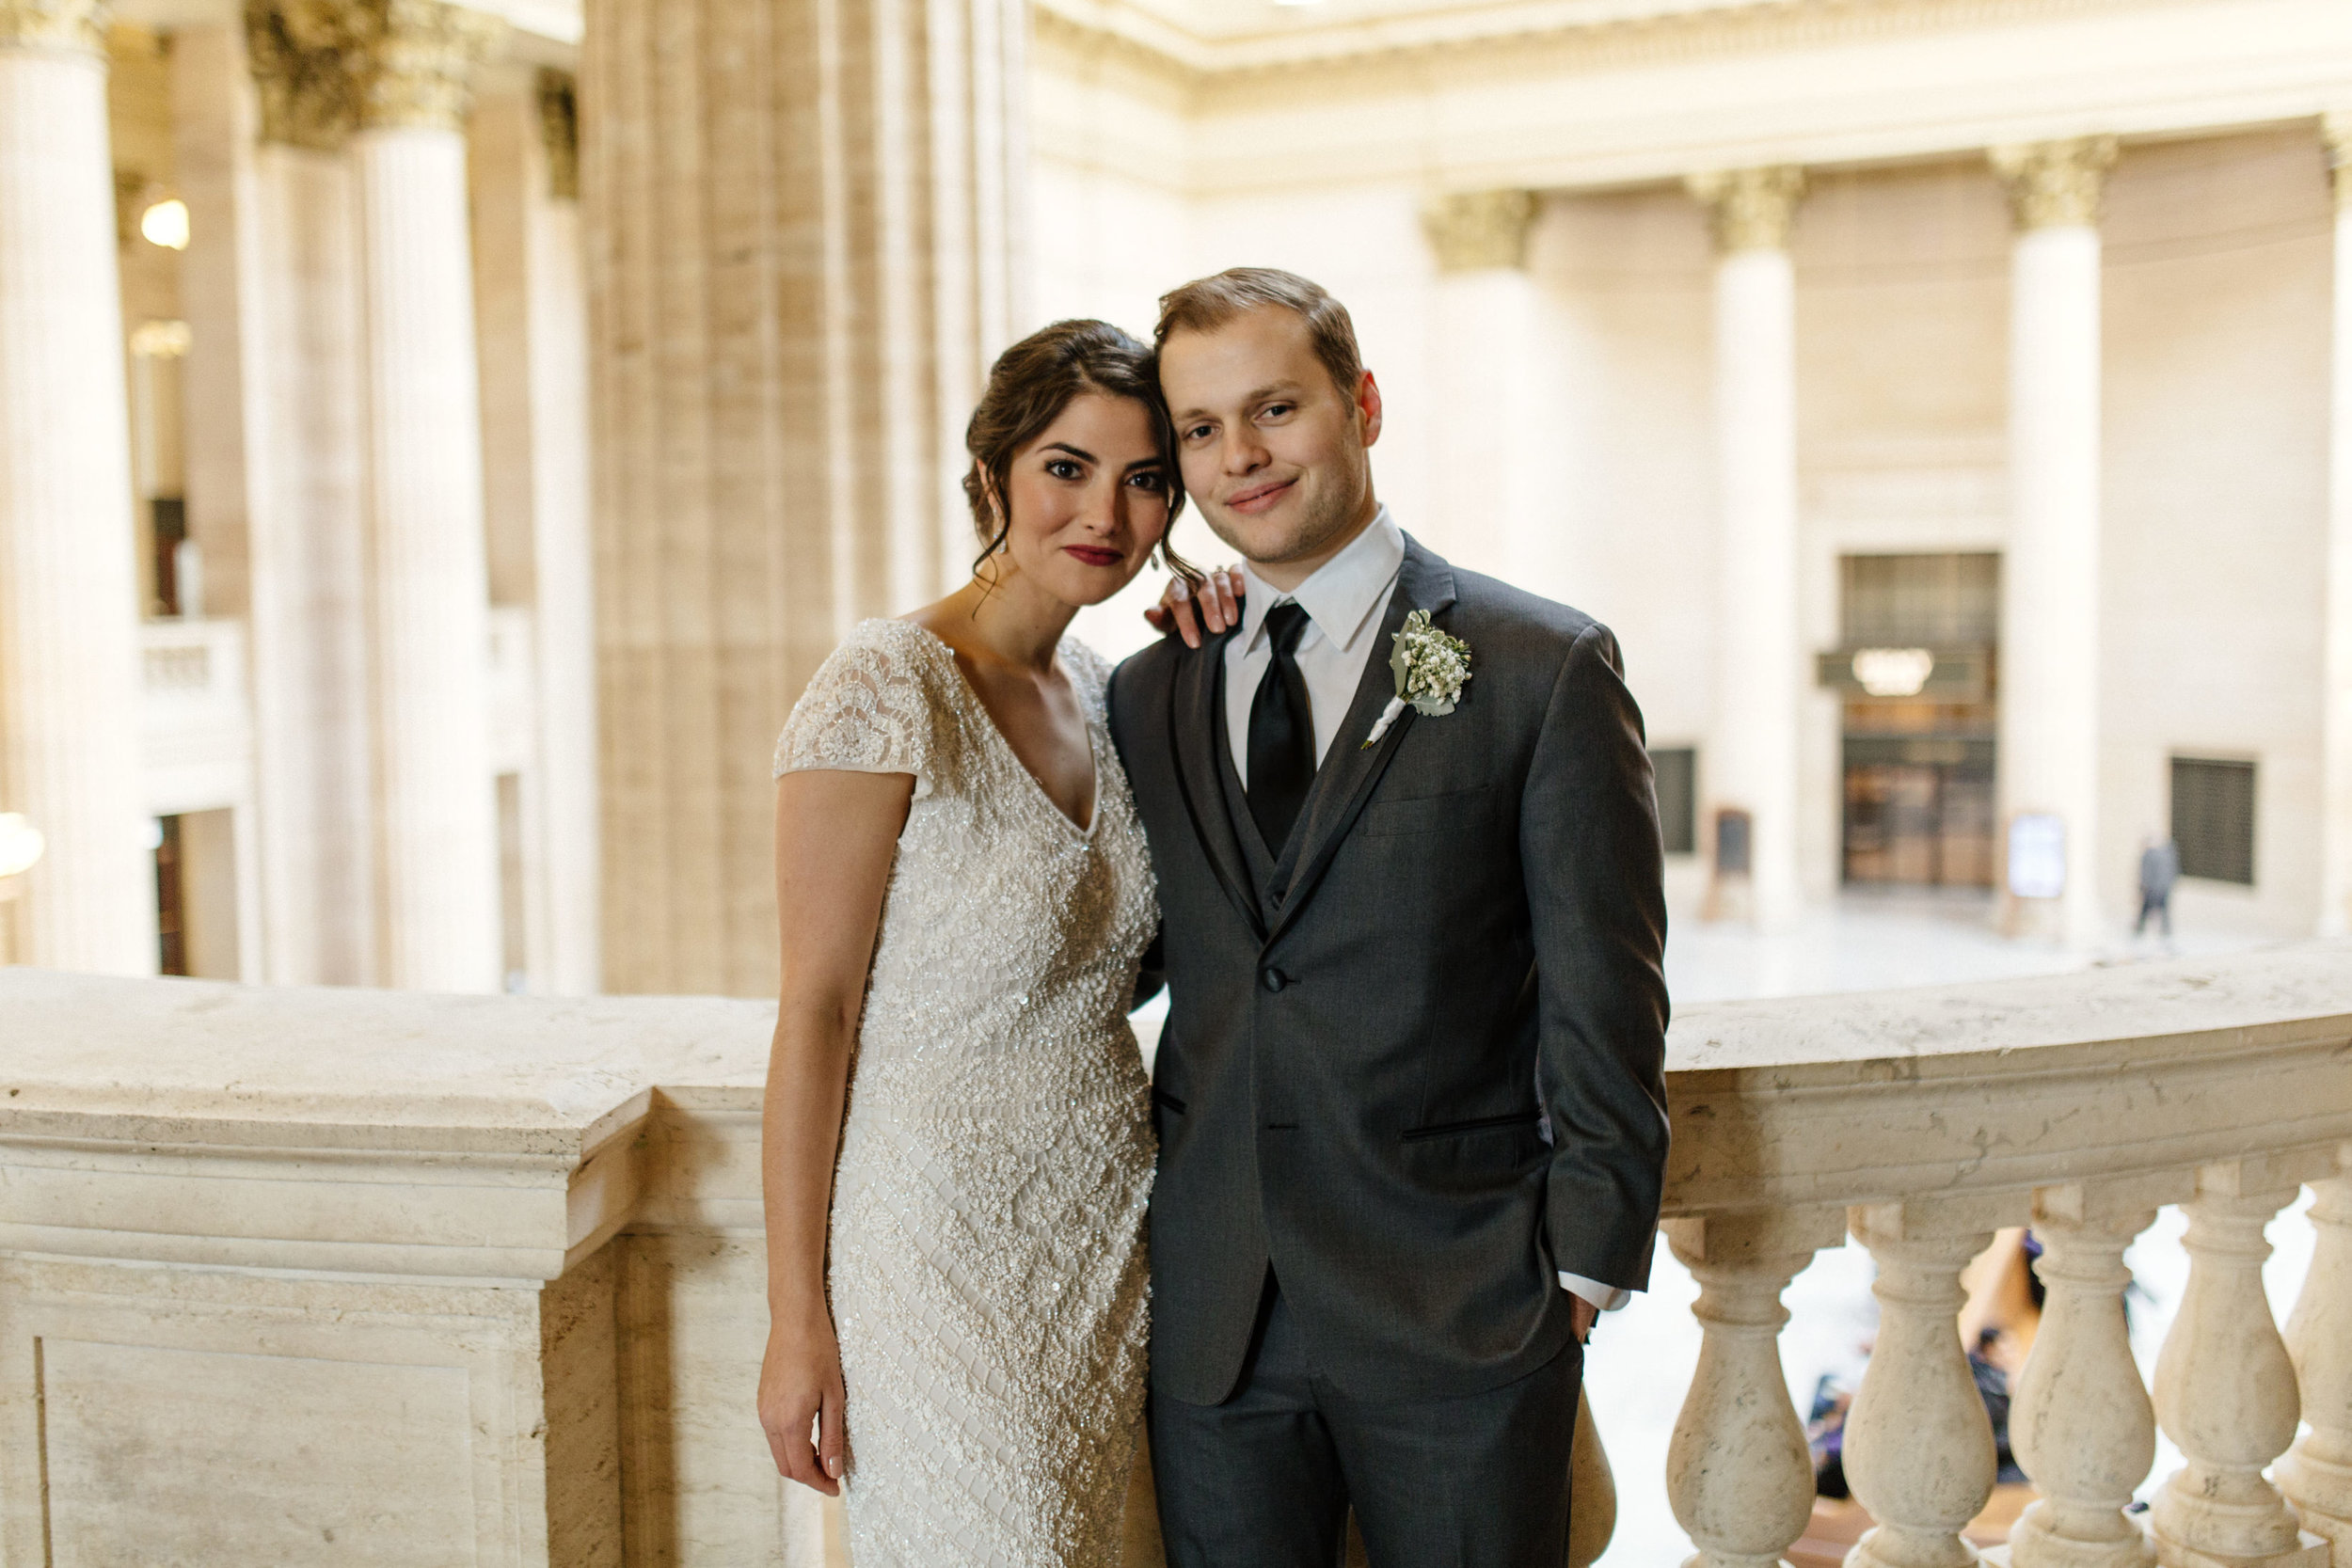 the_bristol_wedding-22.JPG